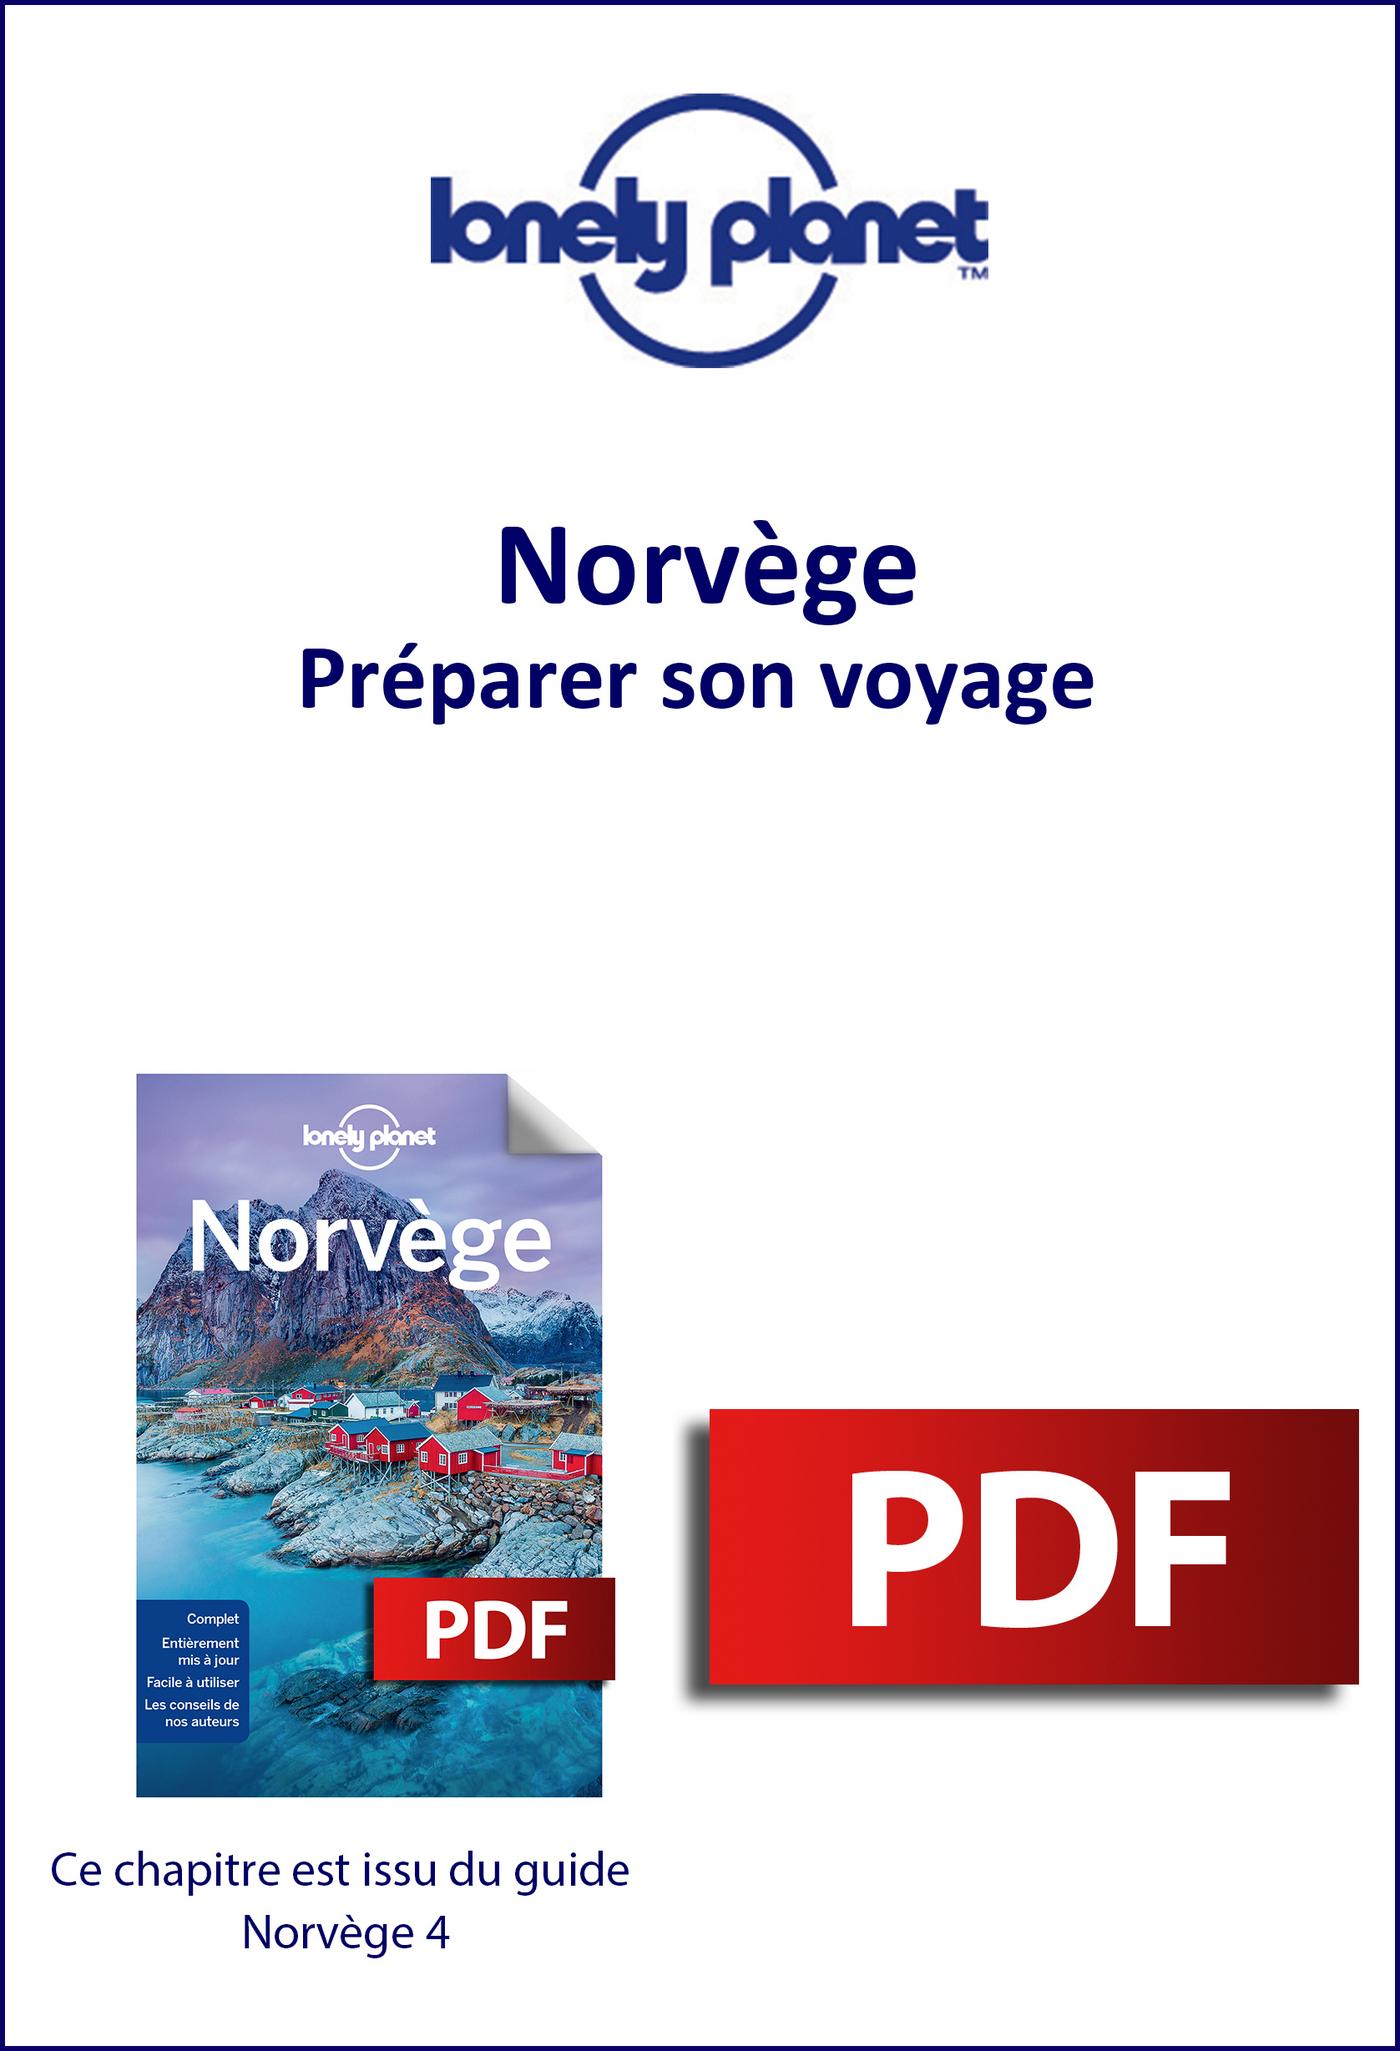 Norvège - Préparer son voyage